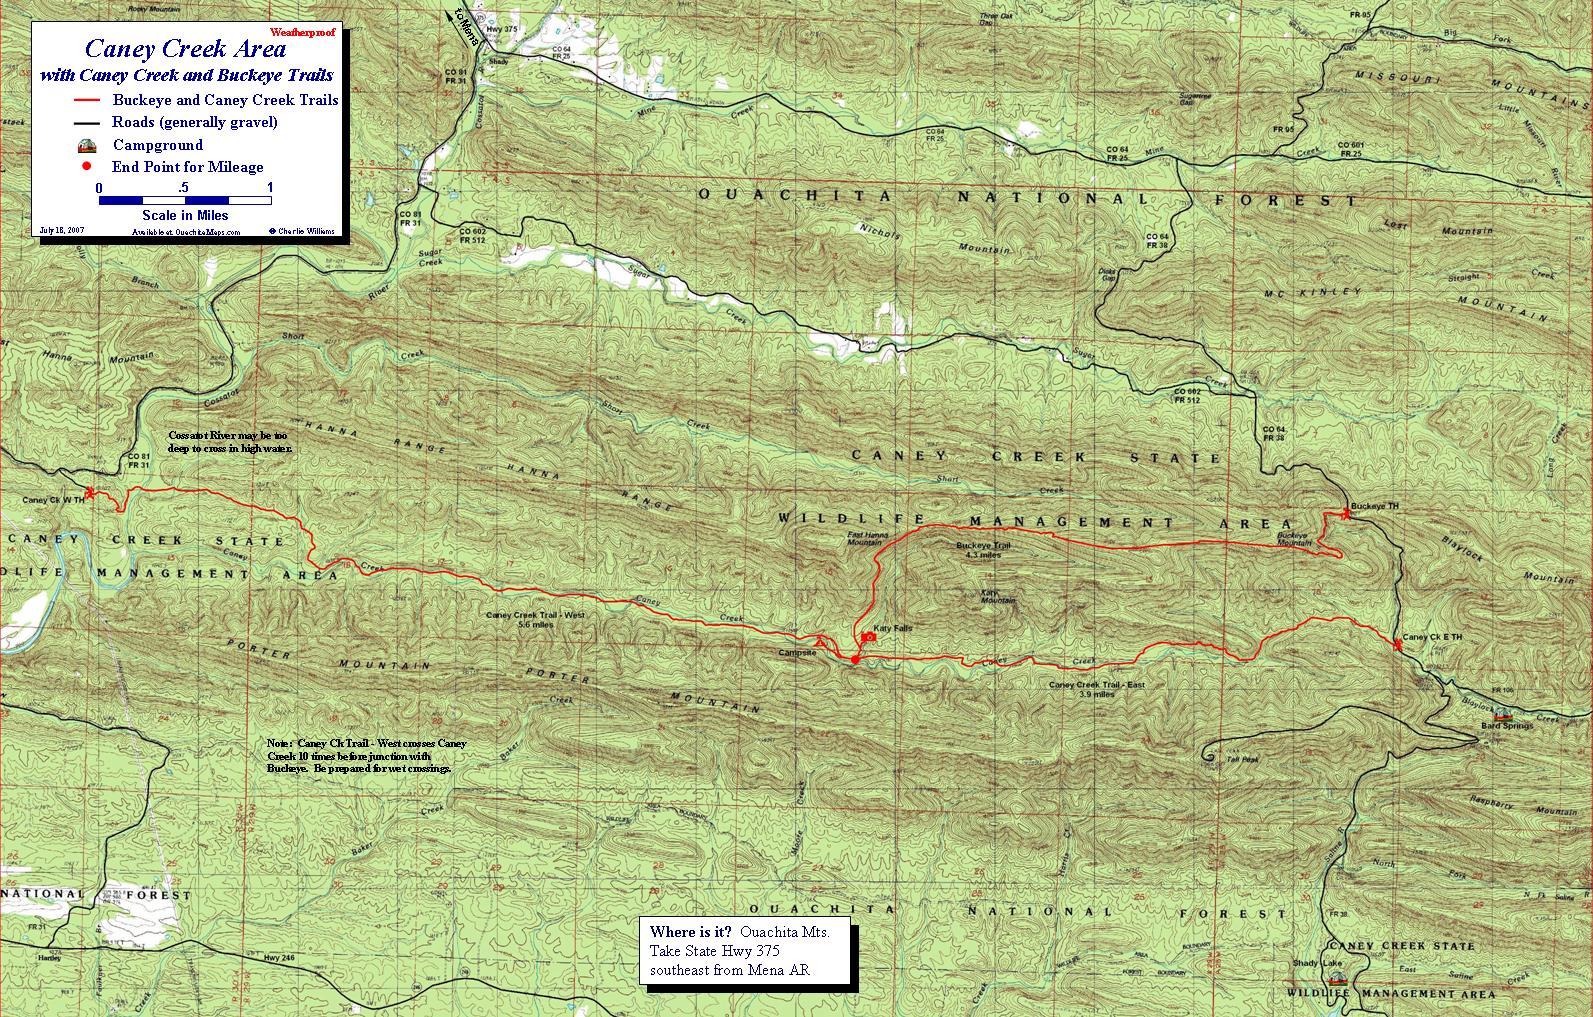 Caney Creek Area, Ouachita Mts, Arkansas